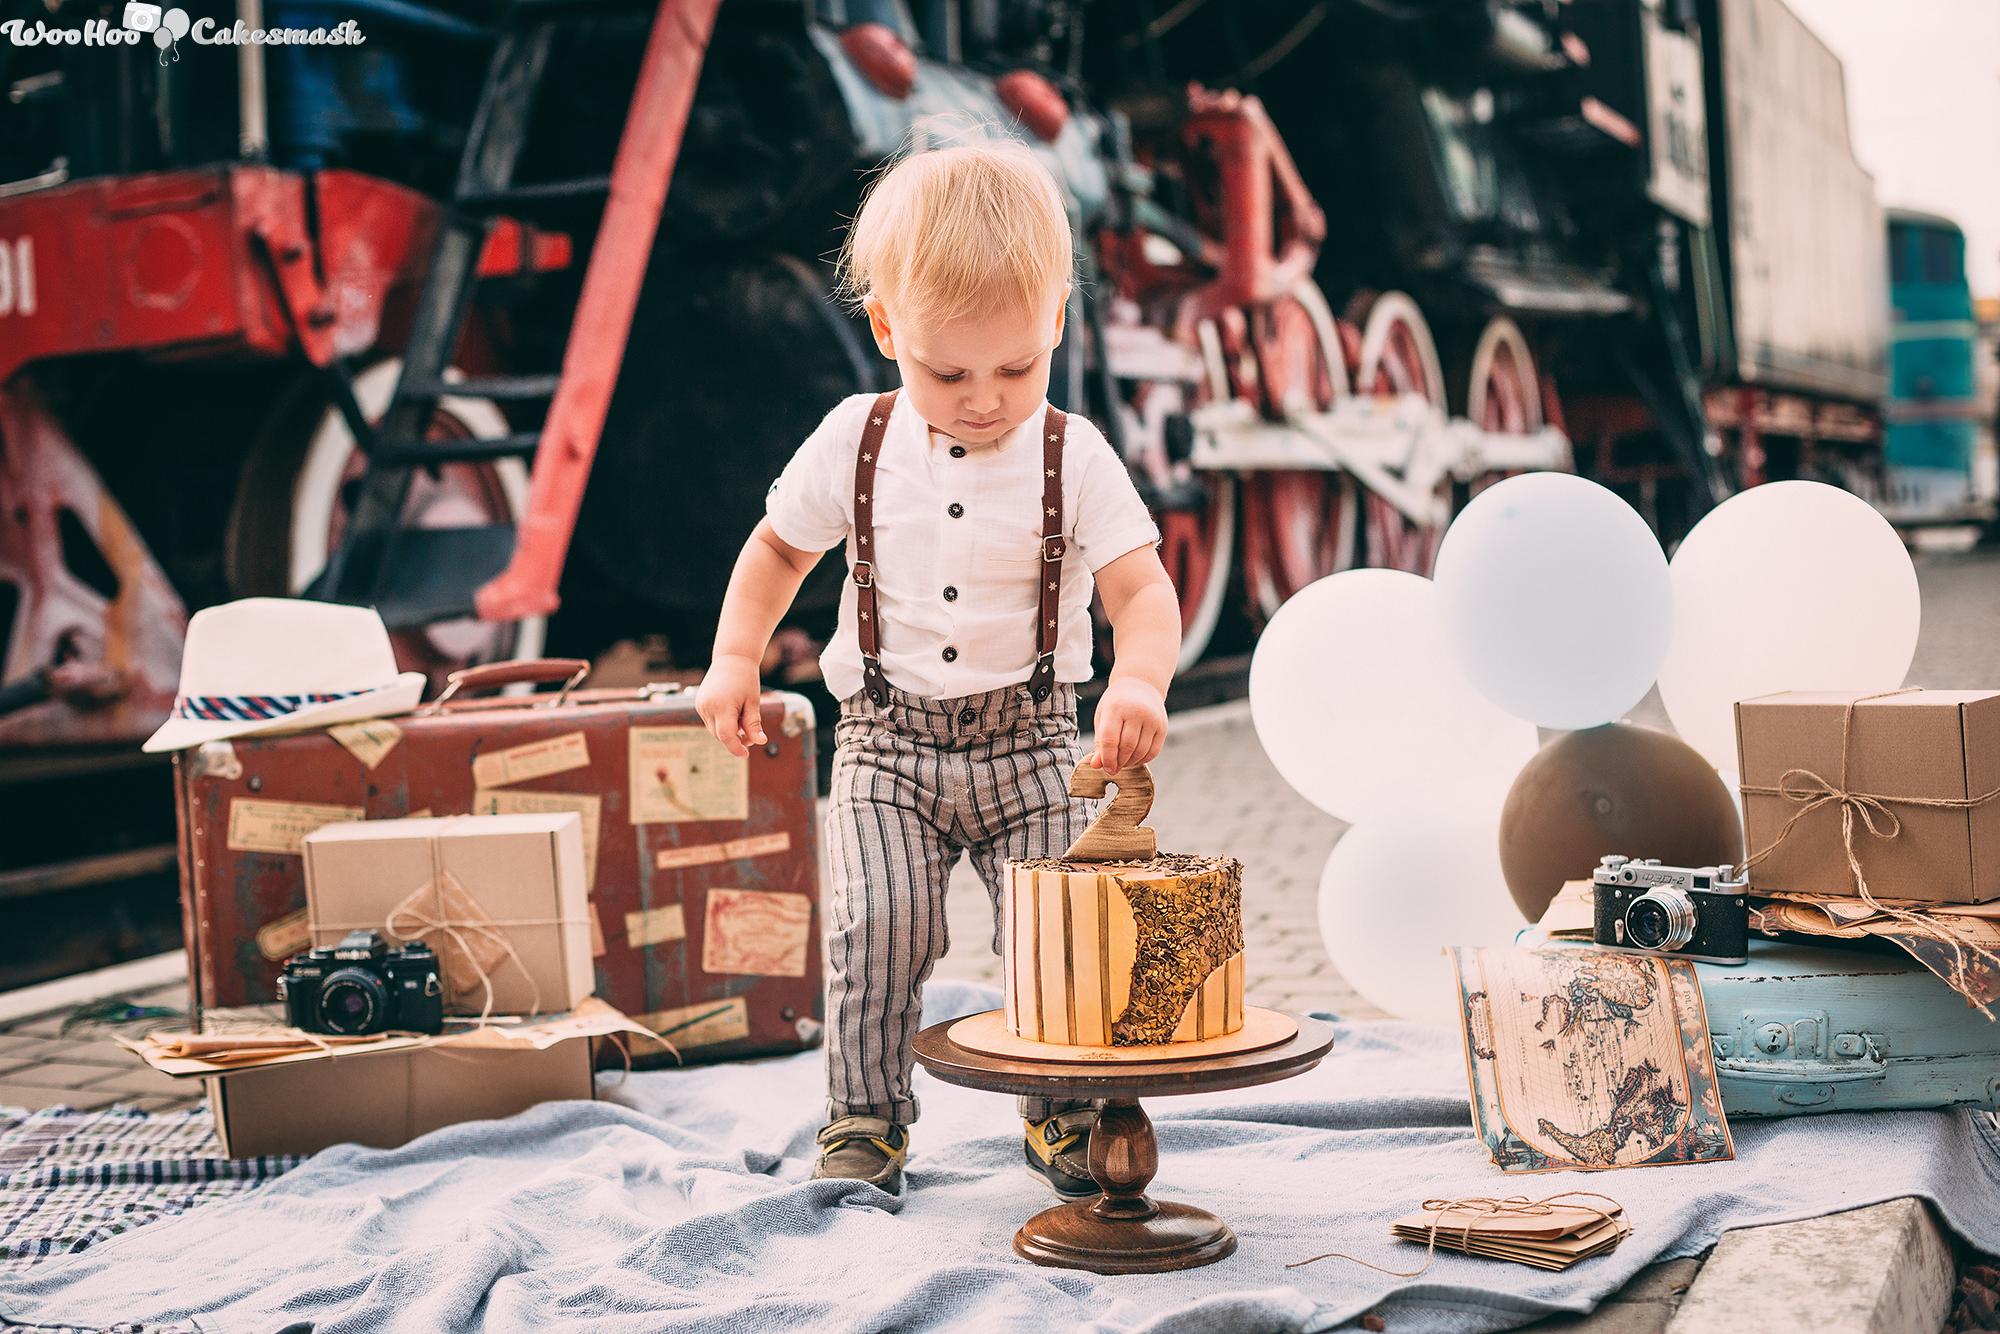 woohoo_cakesmash_Andrey_vintage_4